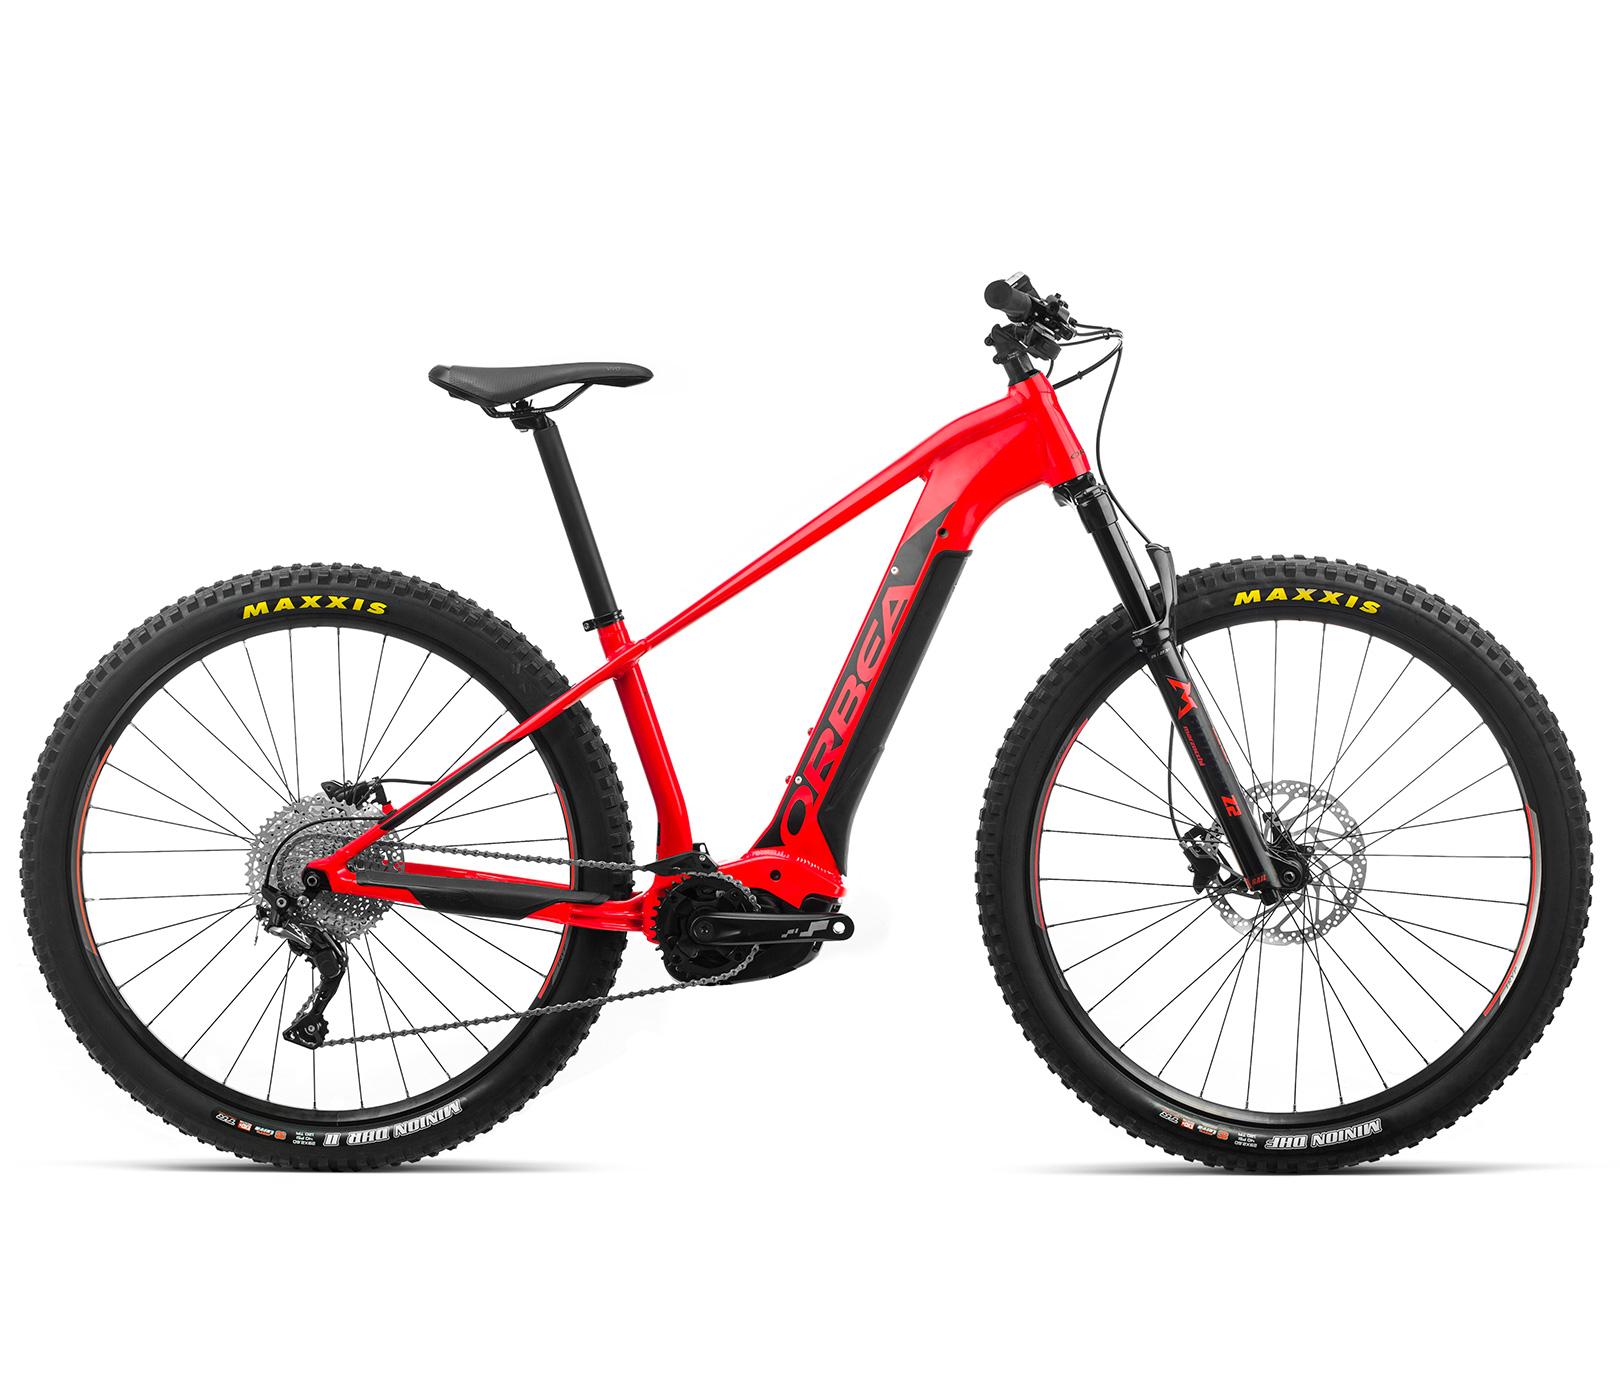 ORBEA WILD HT30 29 ebike - BRIGHT RED (GLOSS) / ZWART (DOF) @G-Bikes